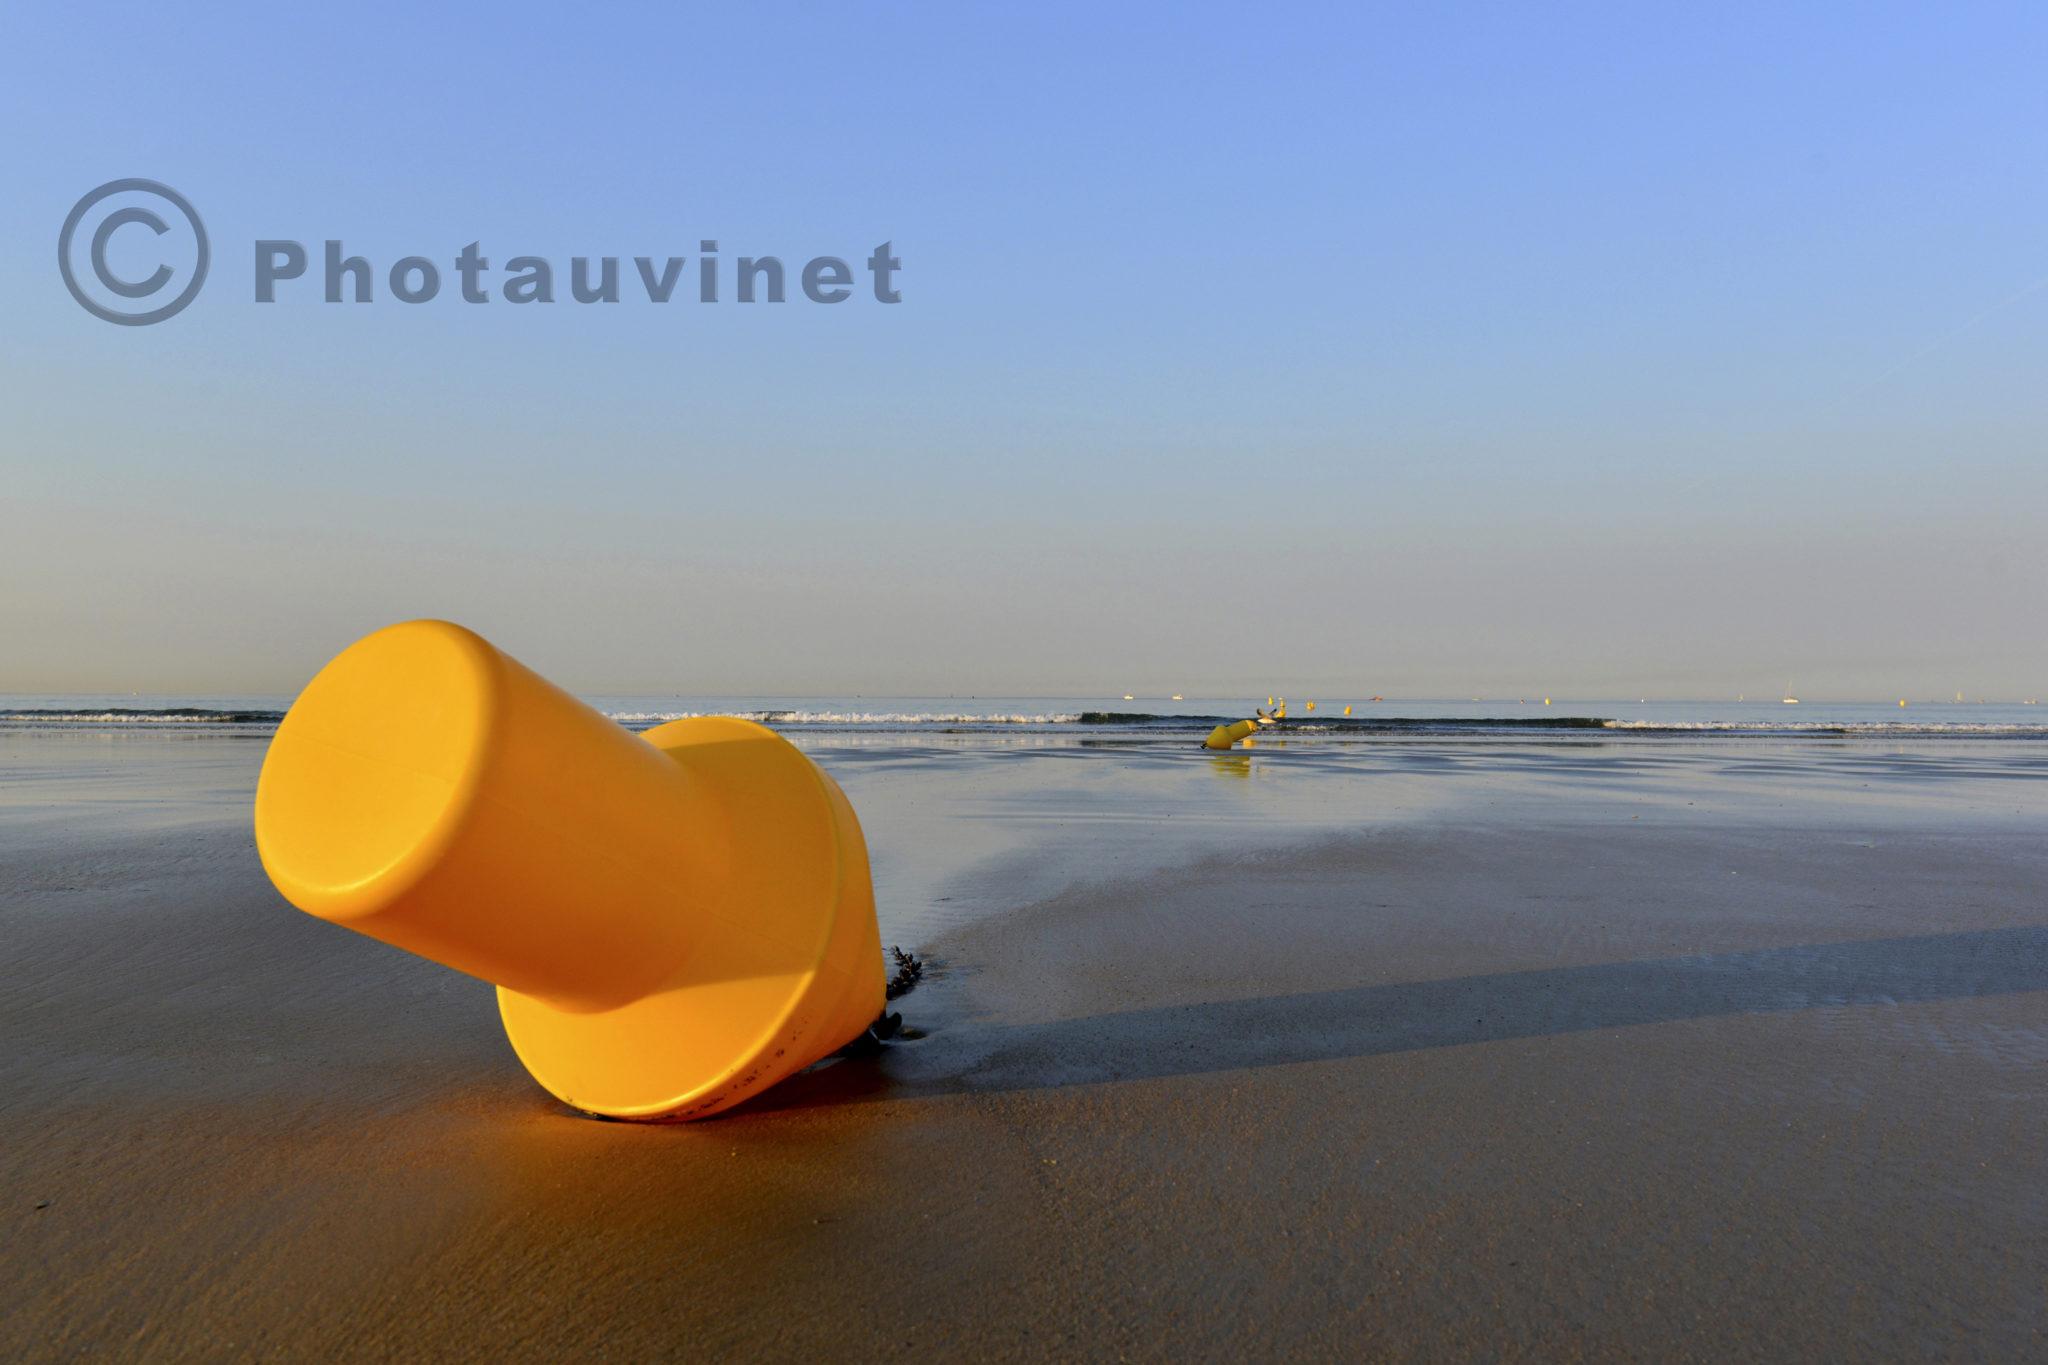 photo J Auvinet